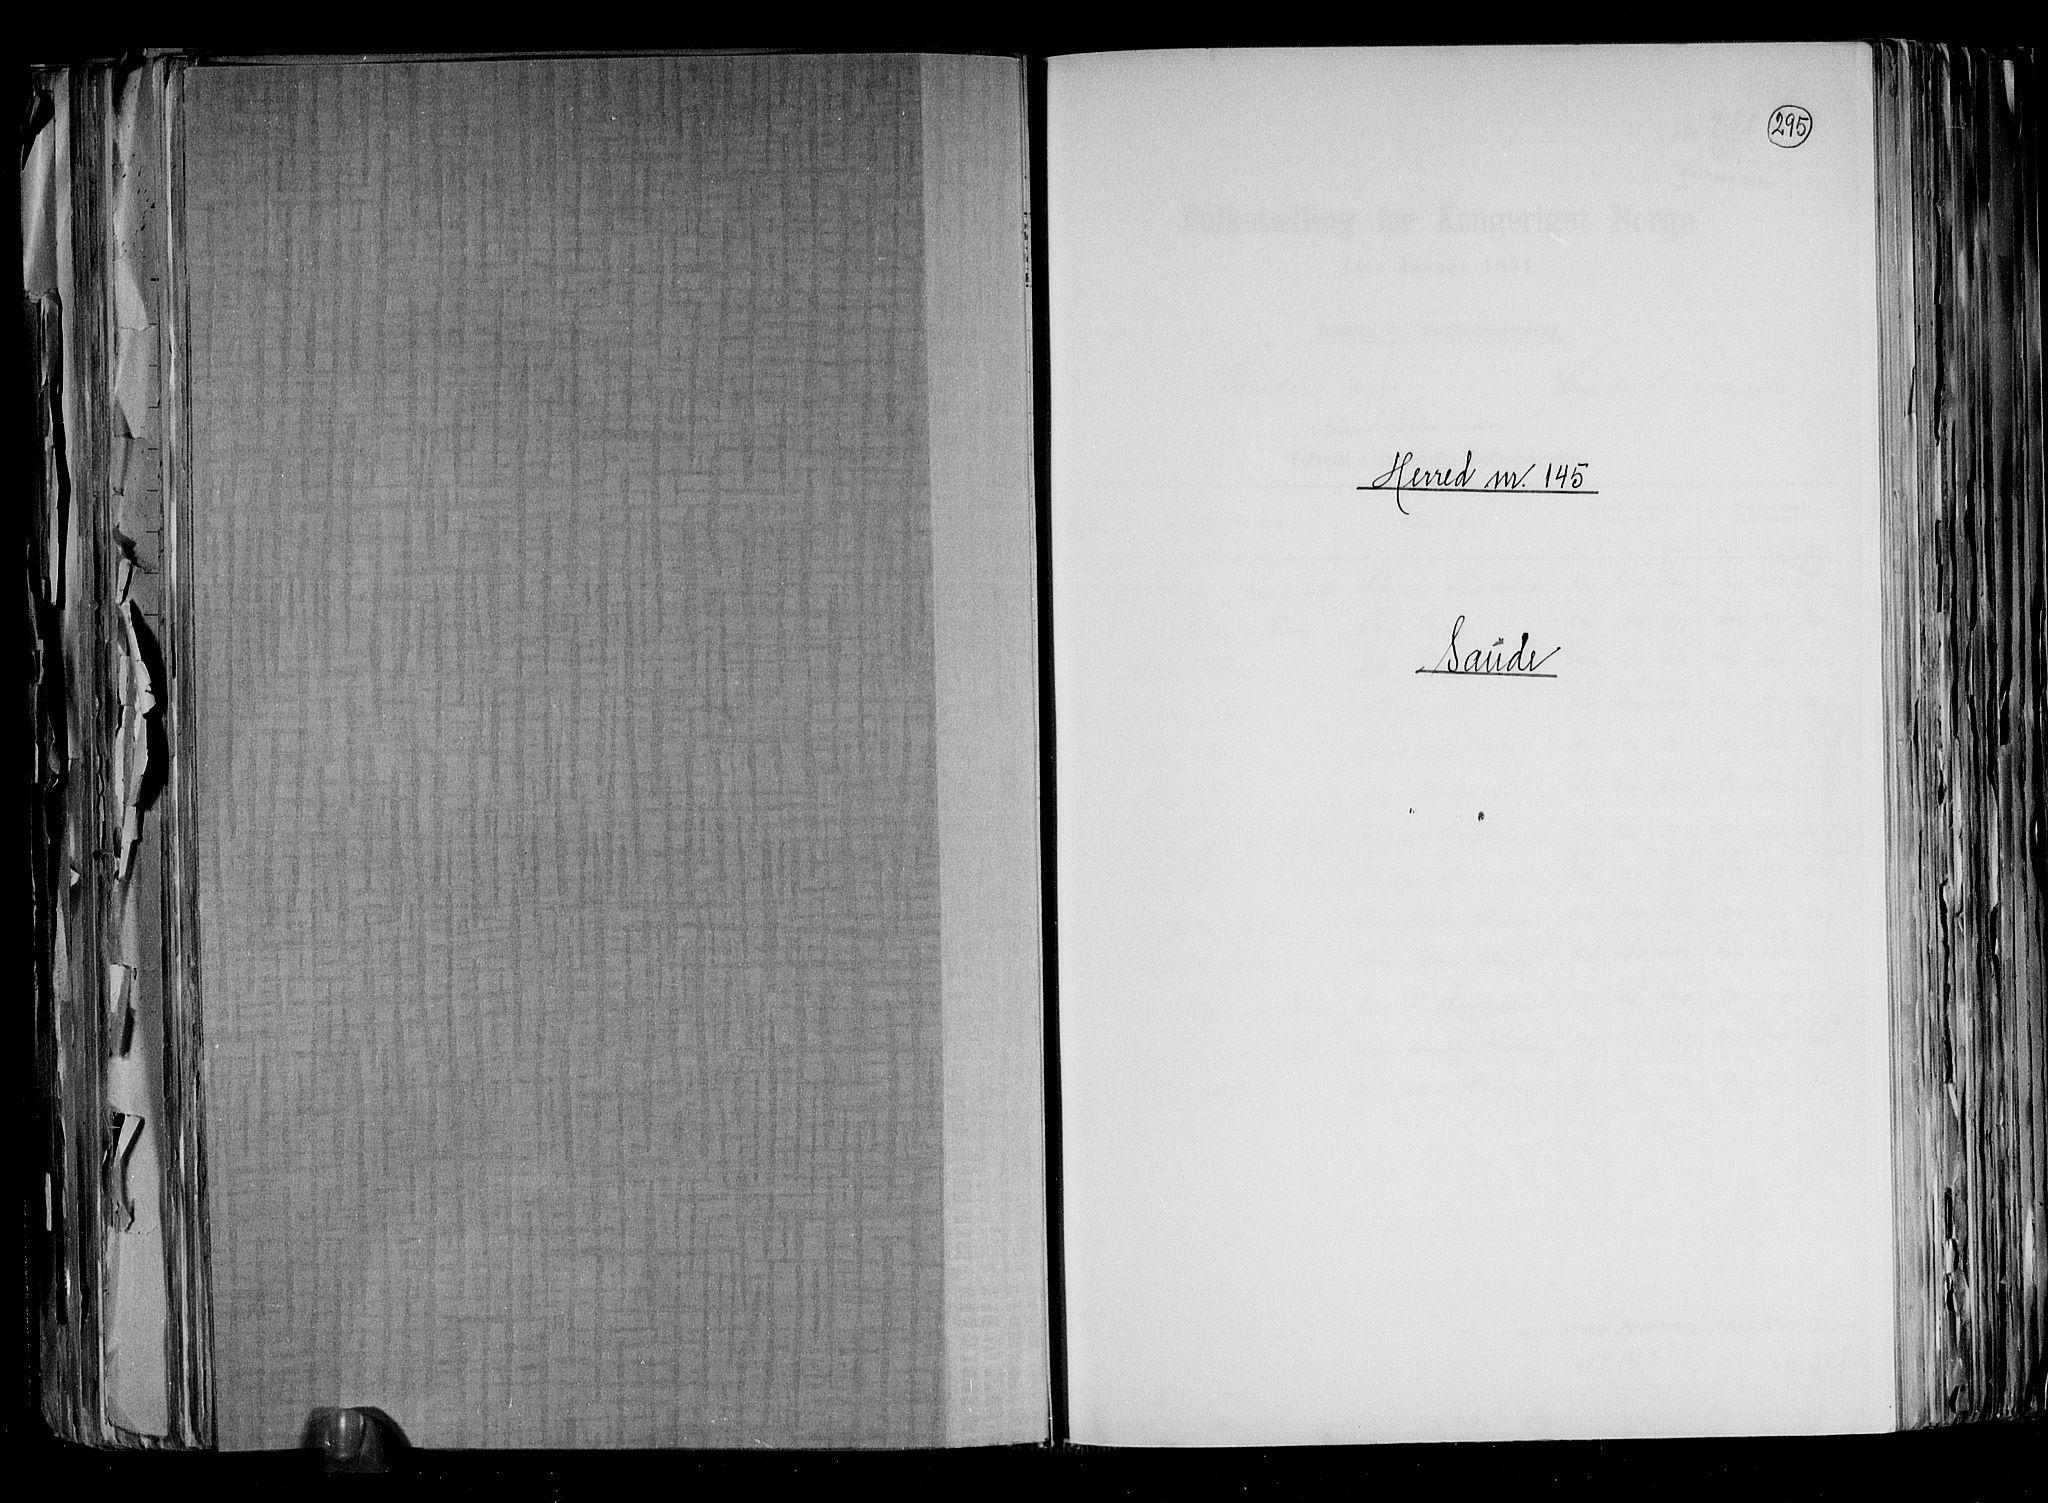 RA, Folketelling 1891 for 0822 Sauherad herred, 1891, s. 1